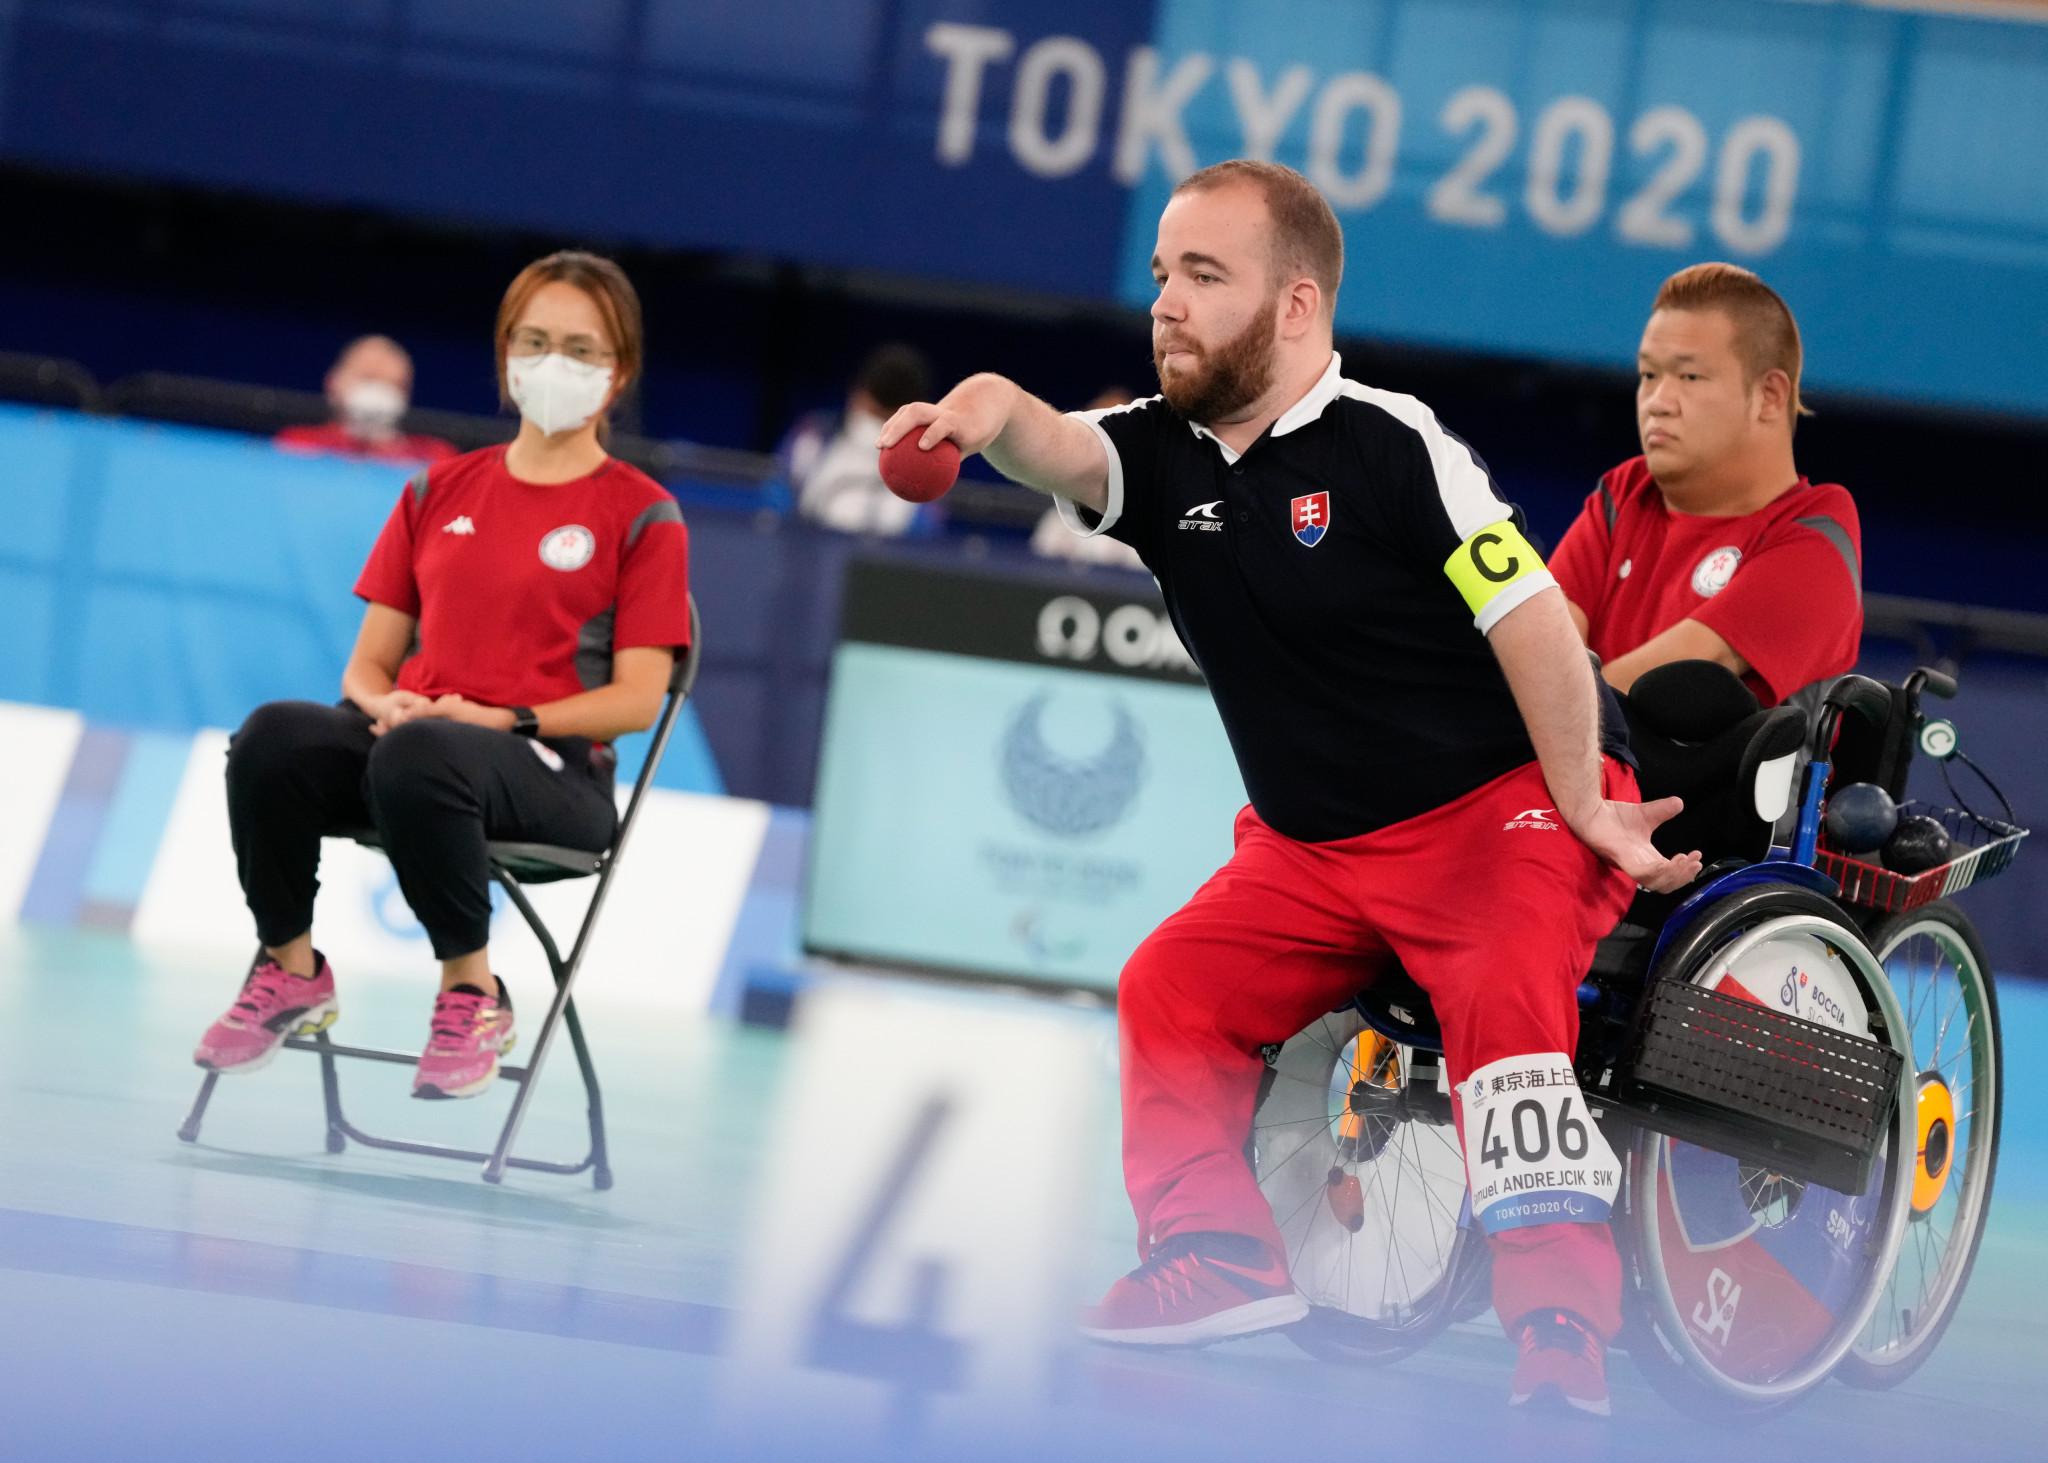 Slovakia retain pairs BC4 boccia title at Tokyo 2020 Paralympics